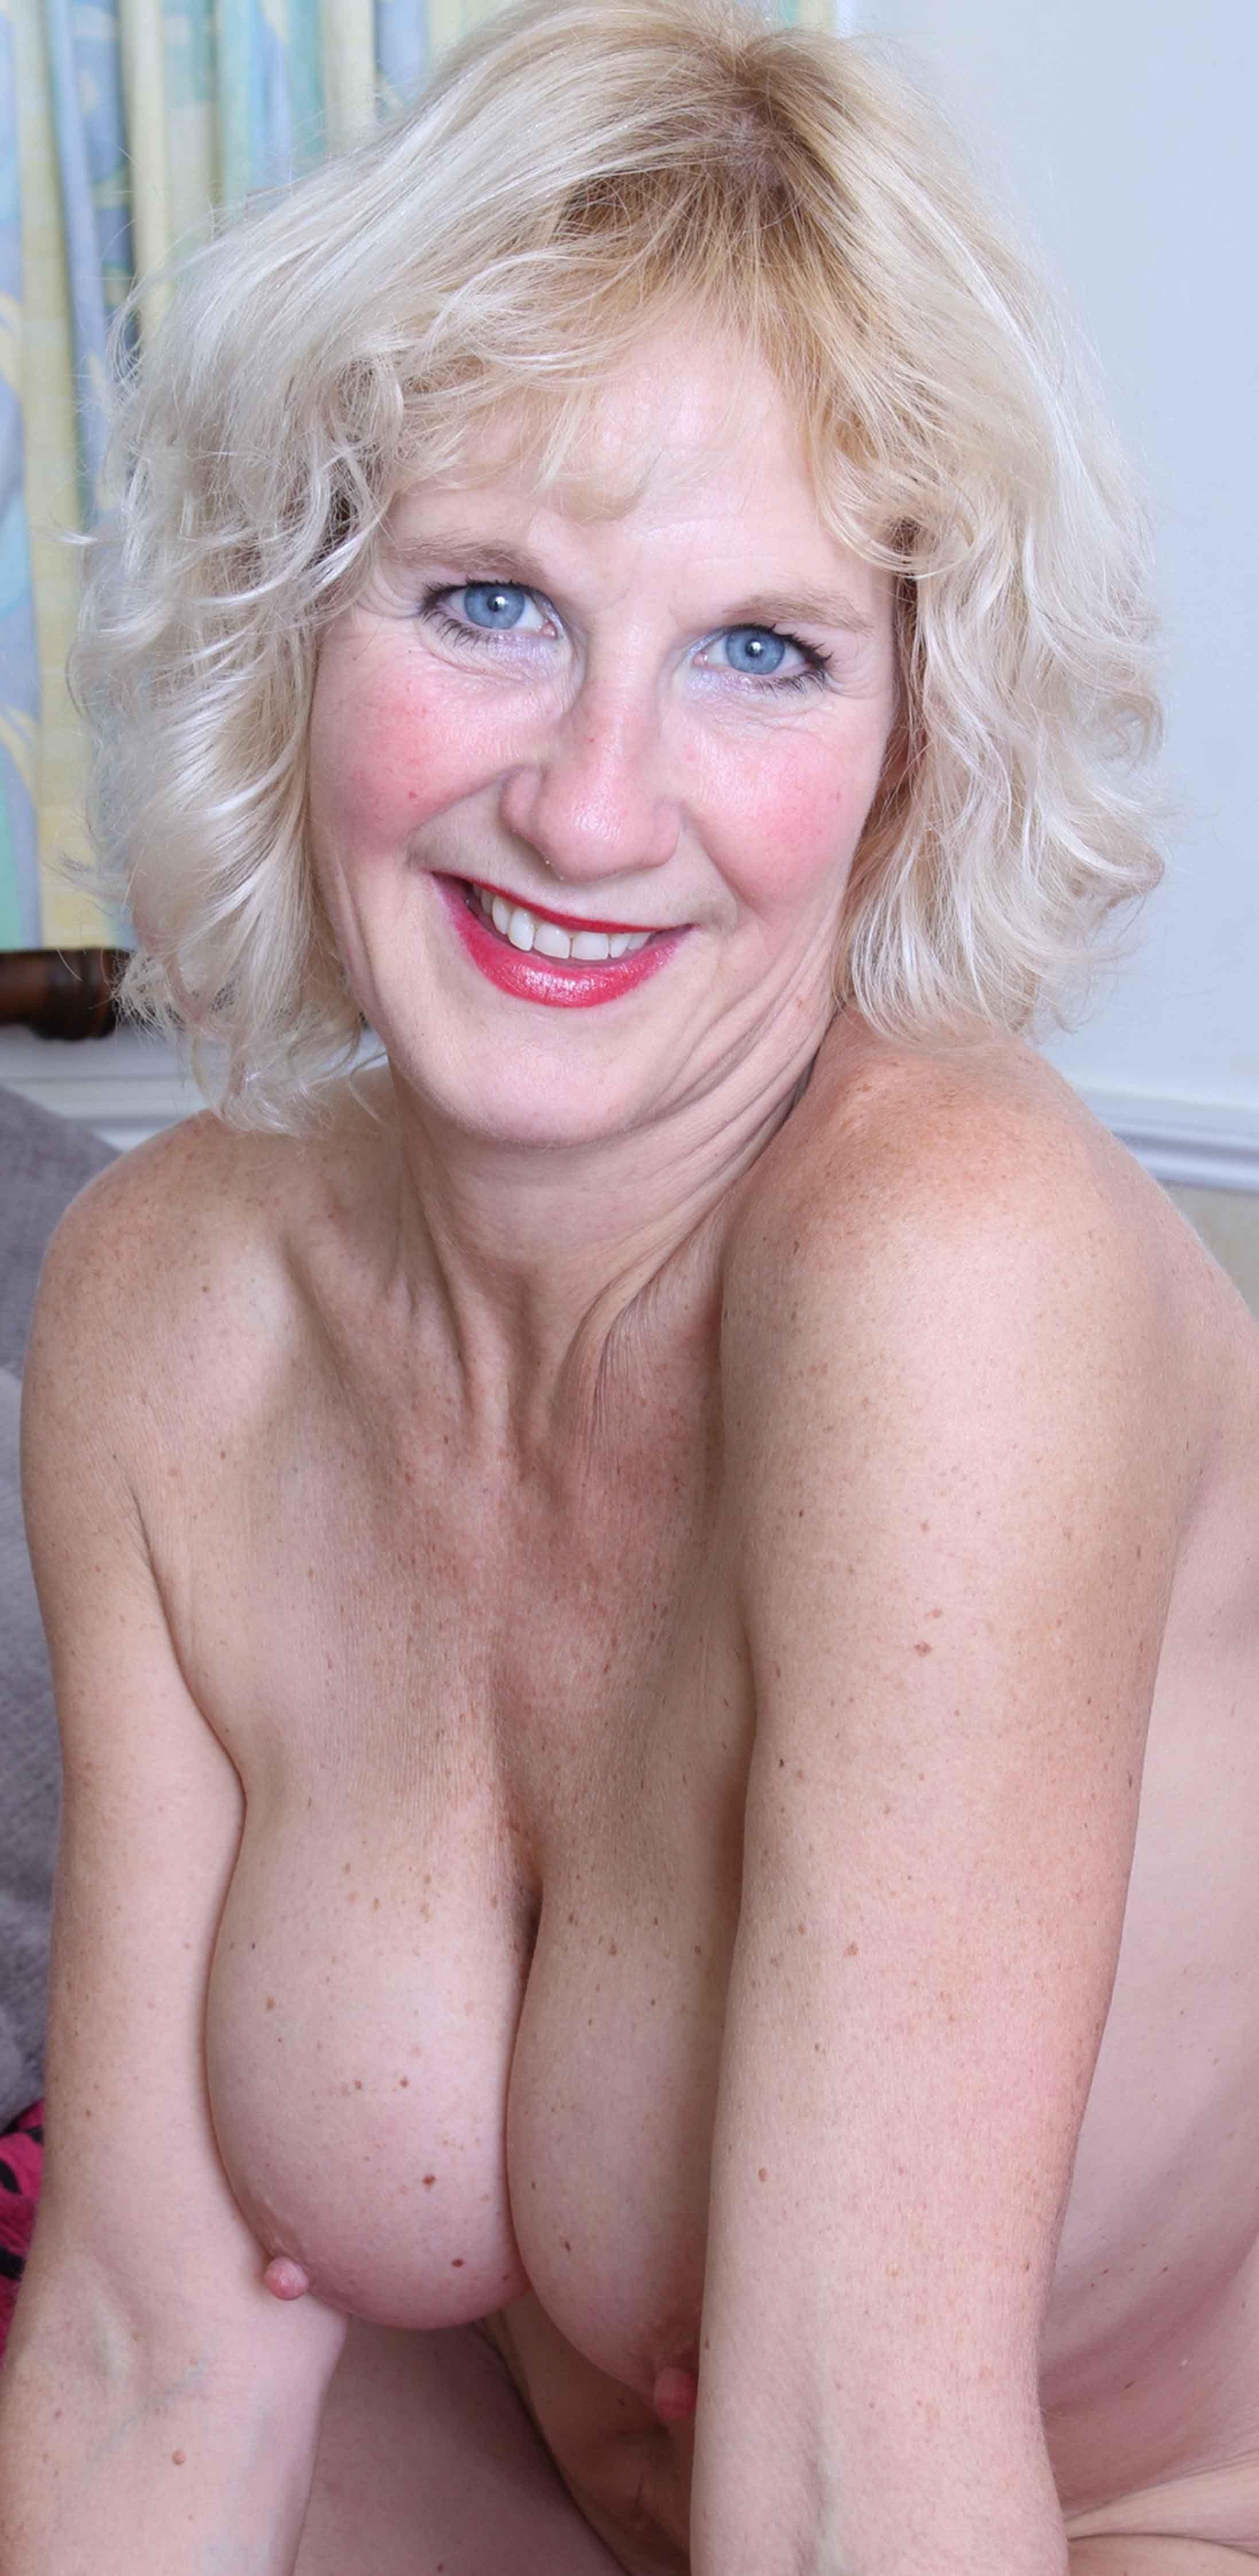 Pin by cowboy bebop on love the older ladies pinterest nina nina hartley nudes bellisima baditri Choice Image